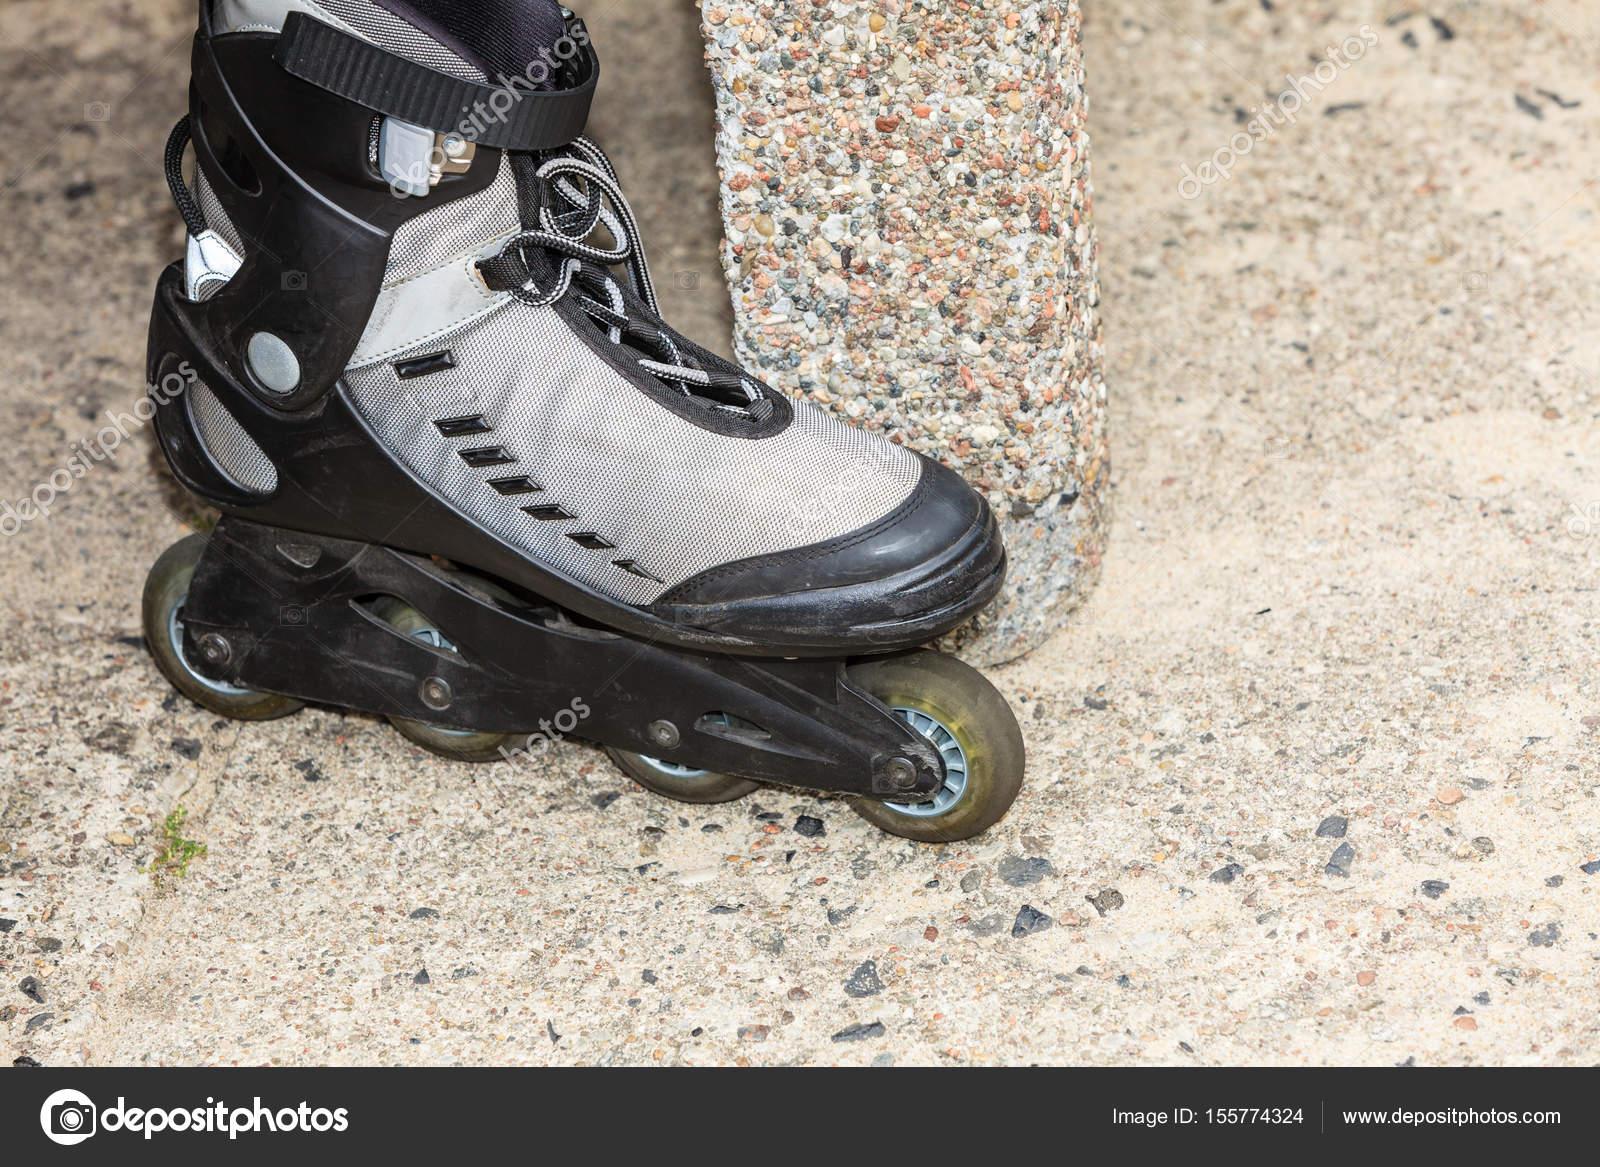 b9ad937afec Closeup of roller skates outdoor. — Stock Photo © Anetlanda #155774324